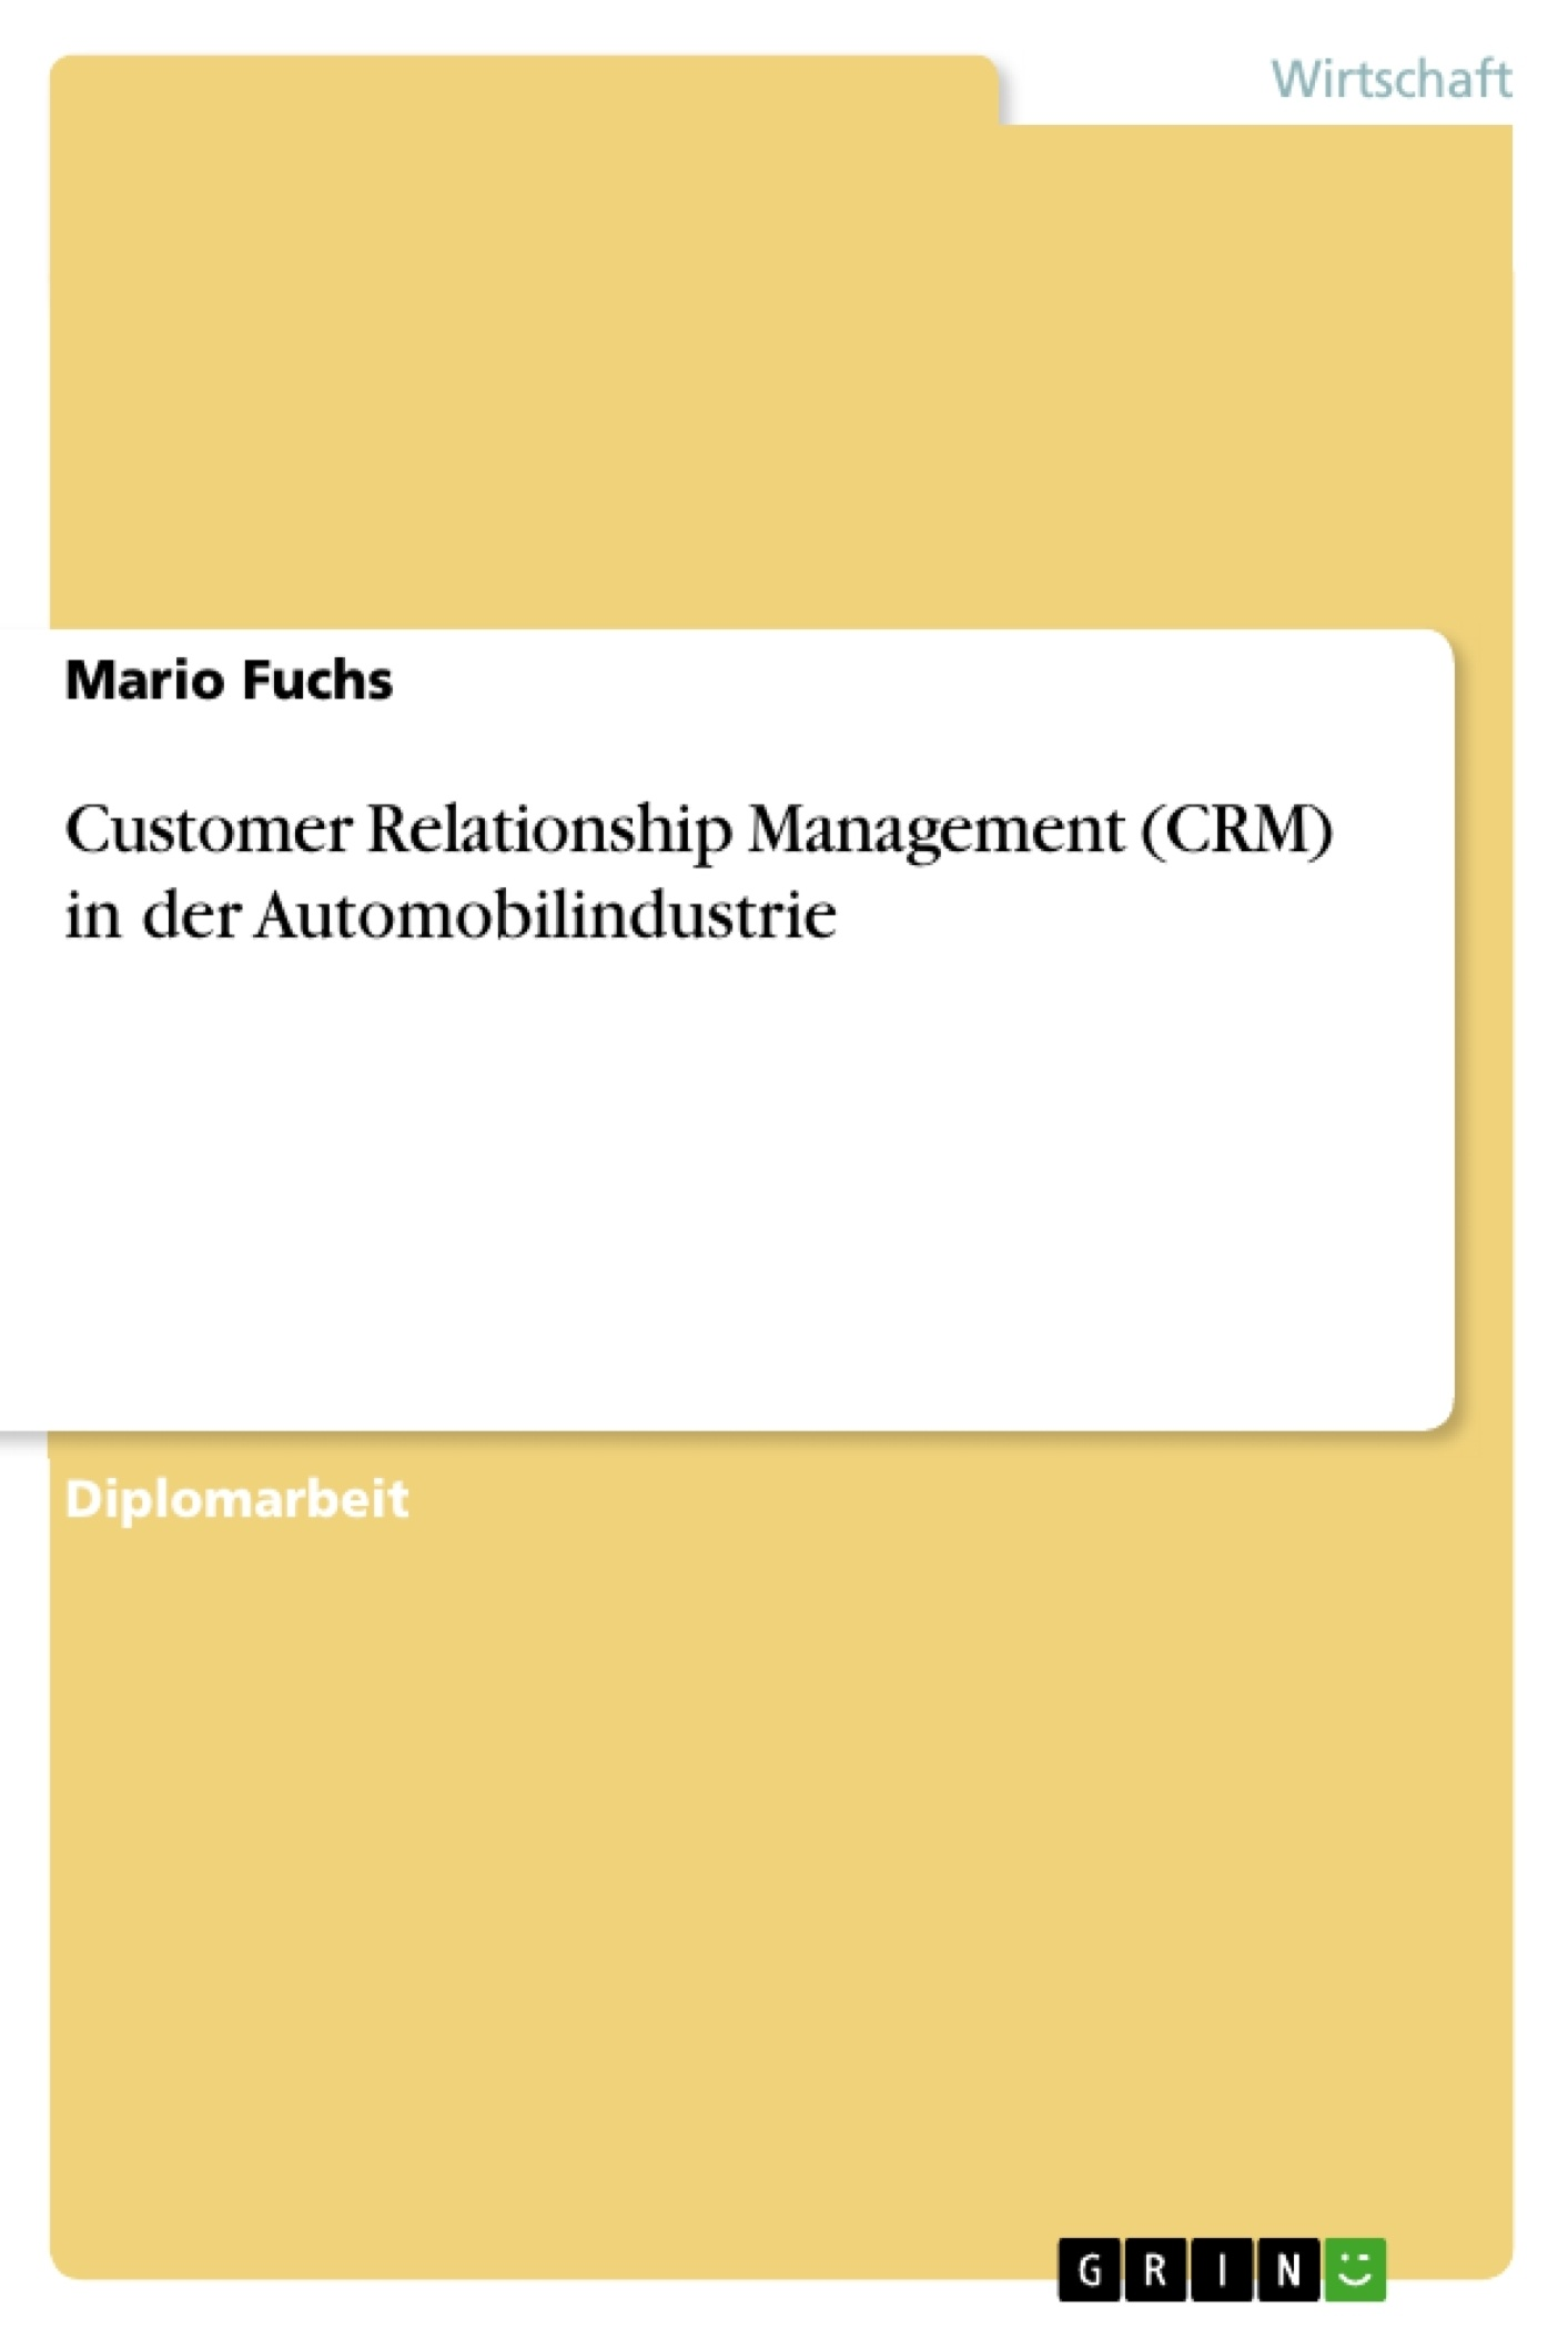 Titel: Customer Relationship Management (CRM) in der Automobilindustrie